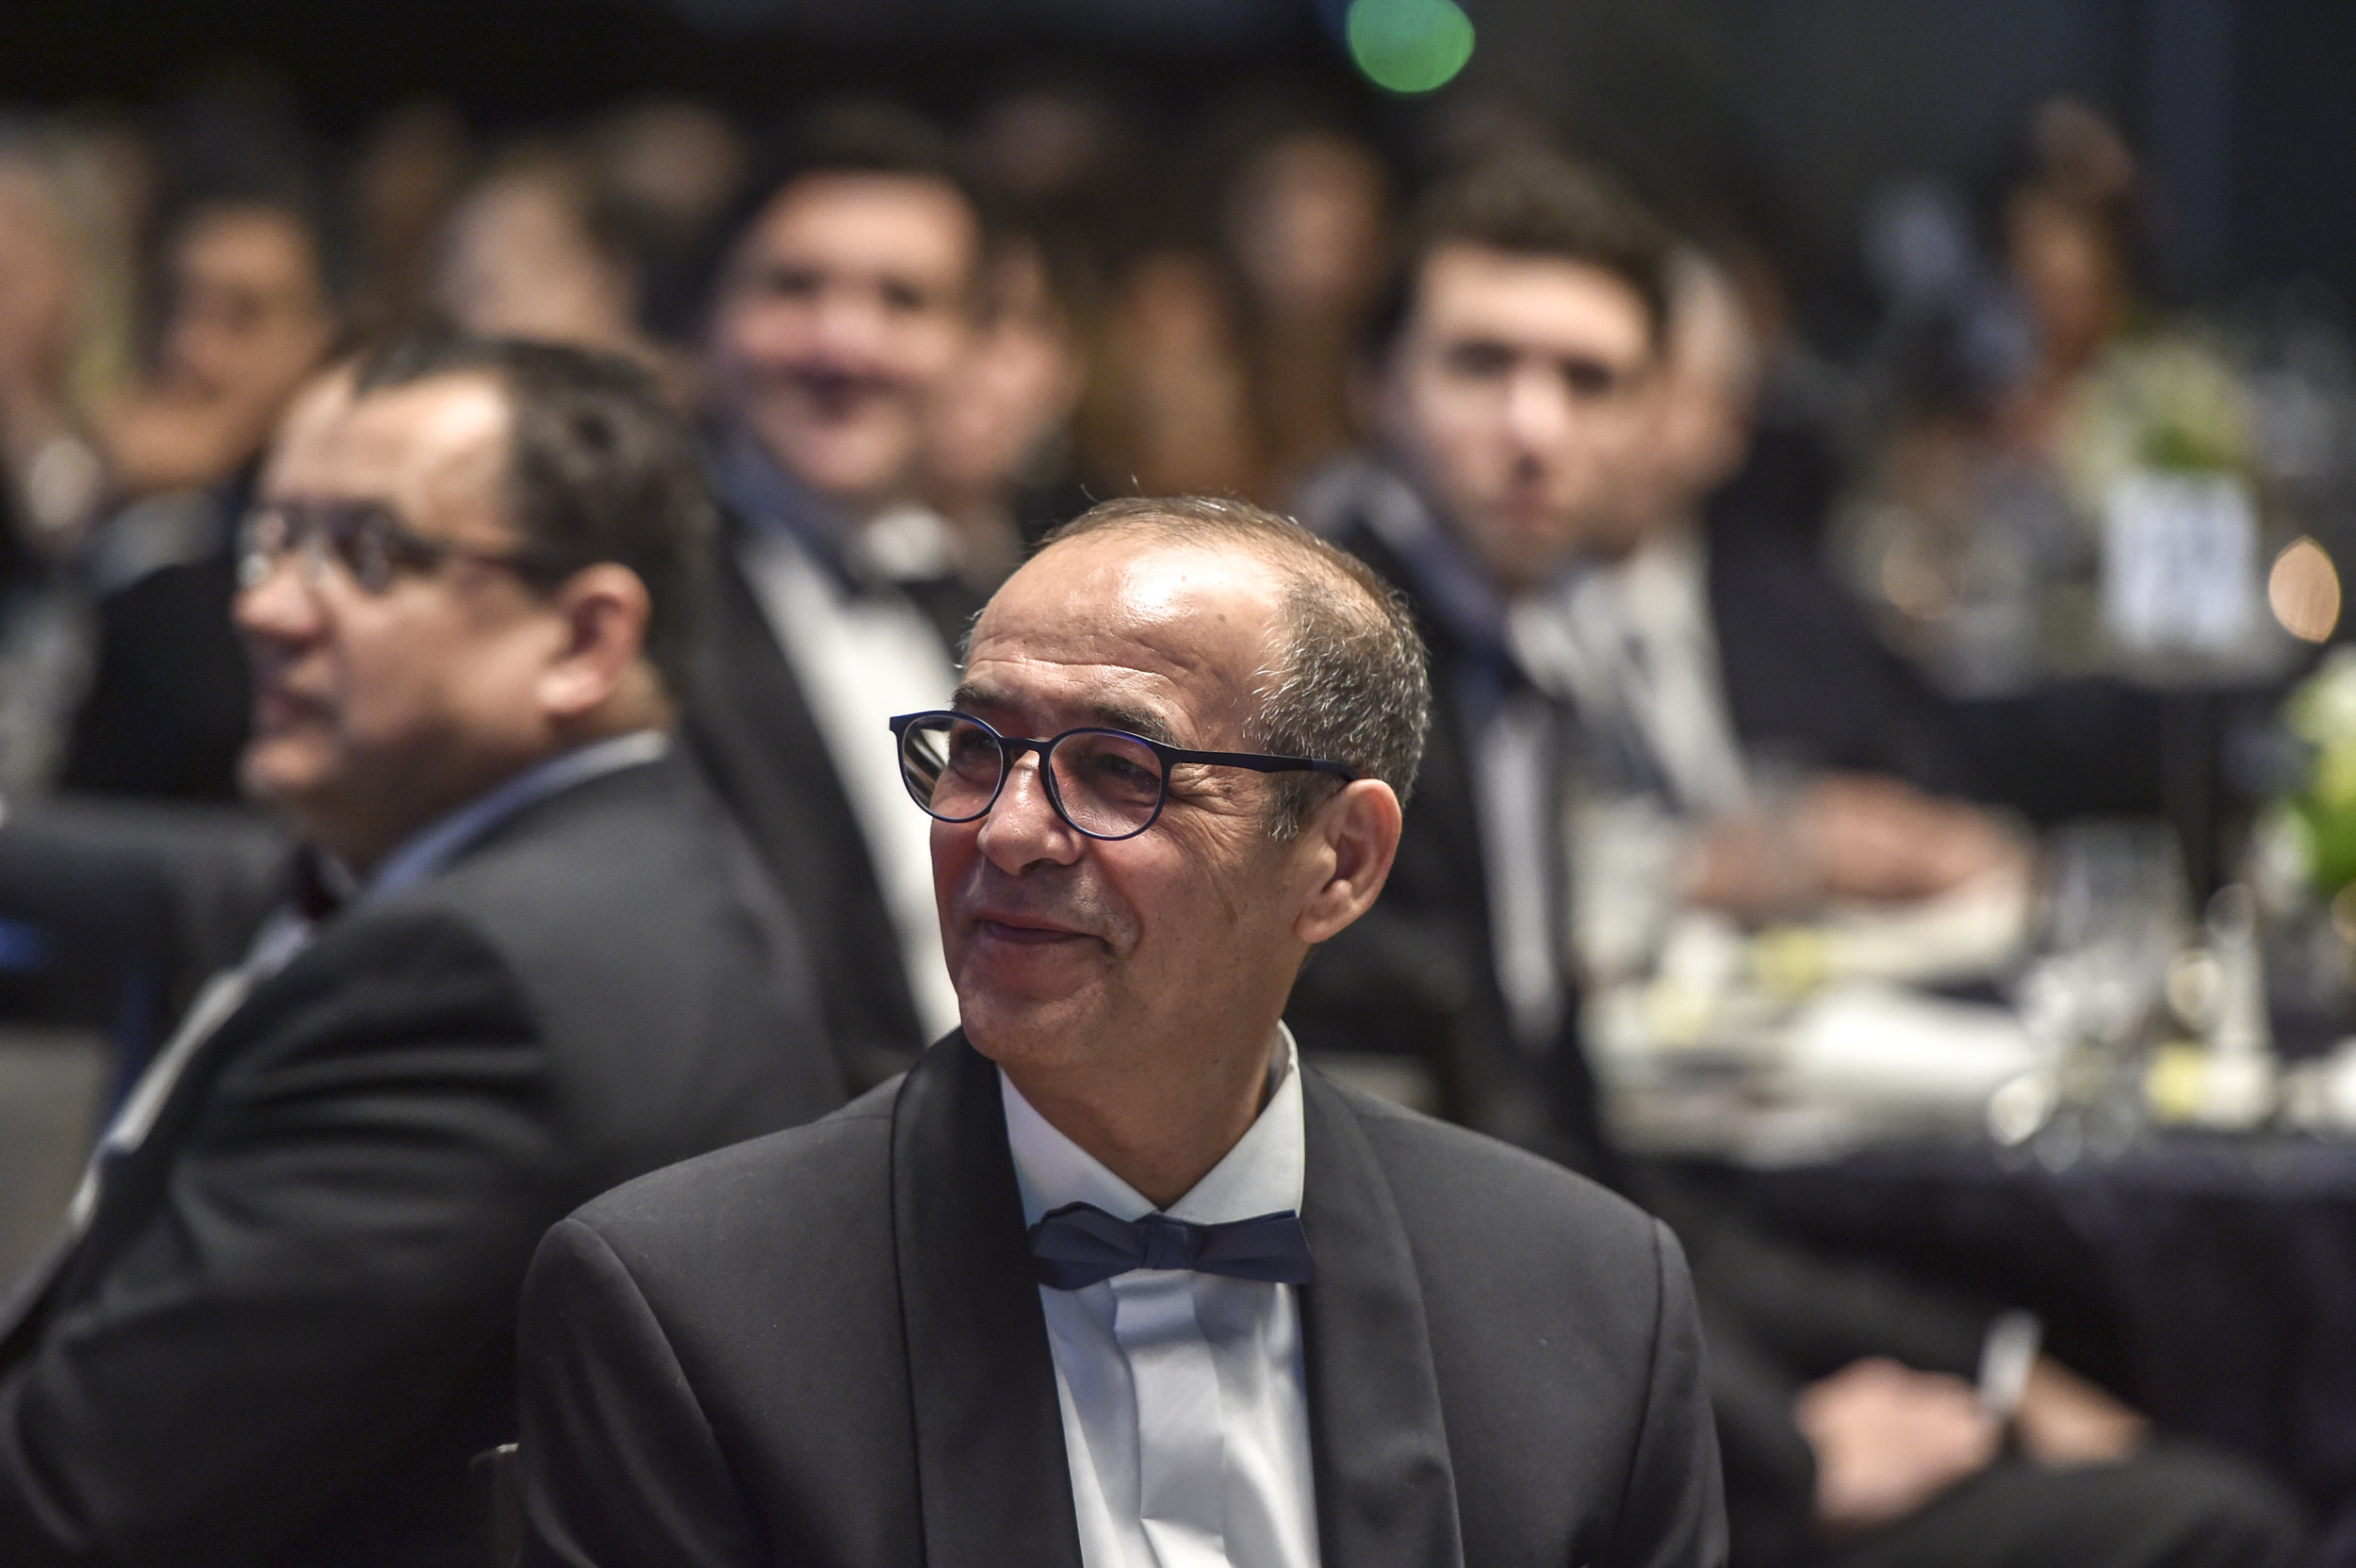 Ambassador of Cyprus to the United States Marios Lysiotis